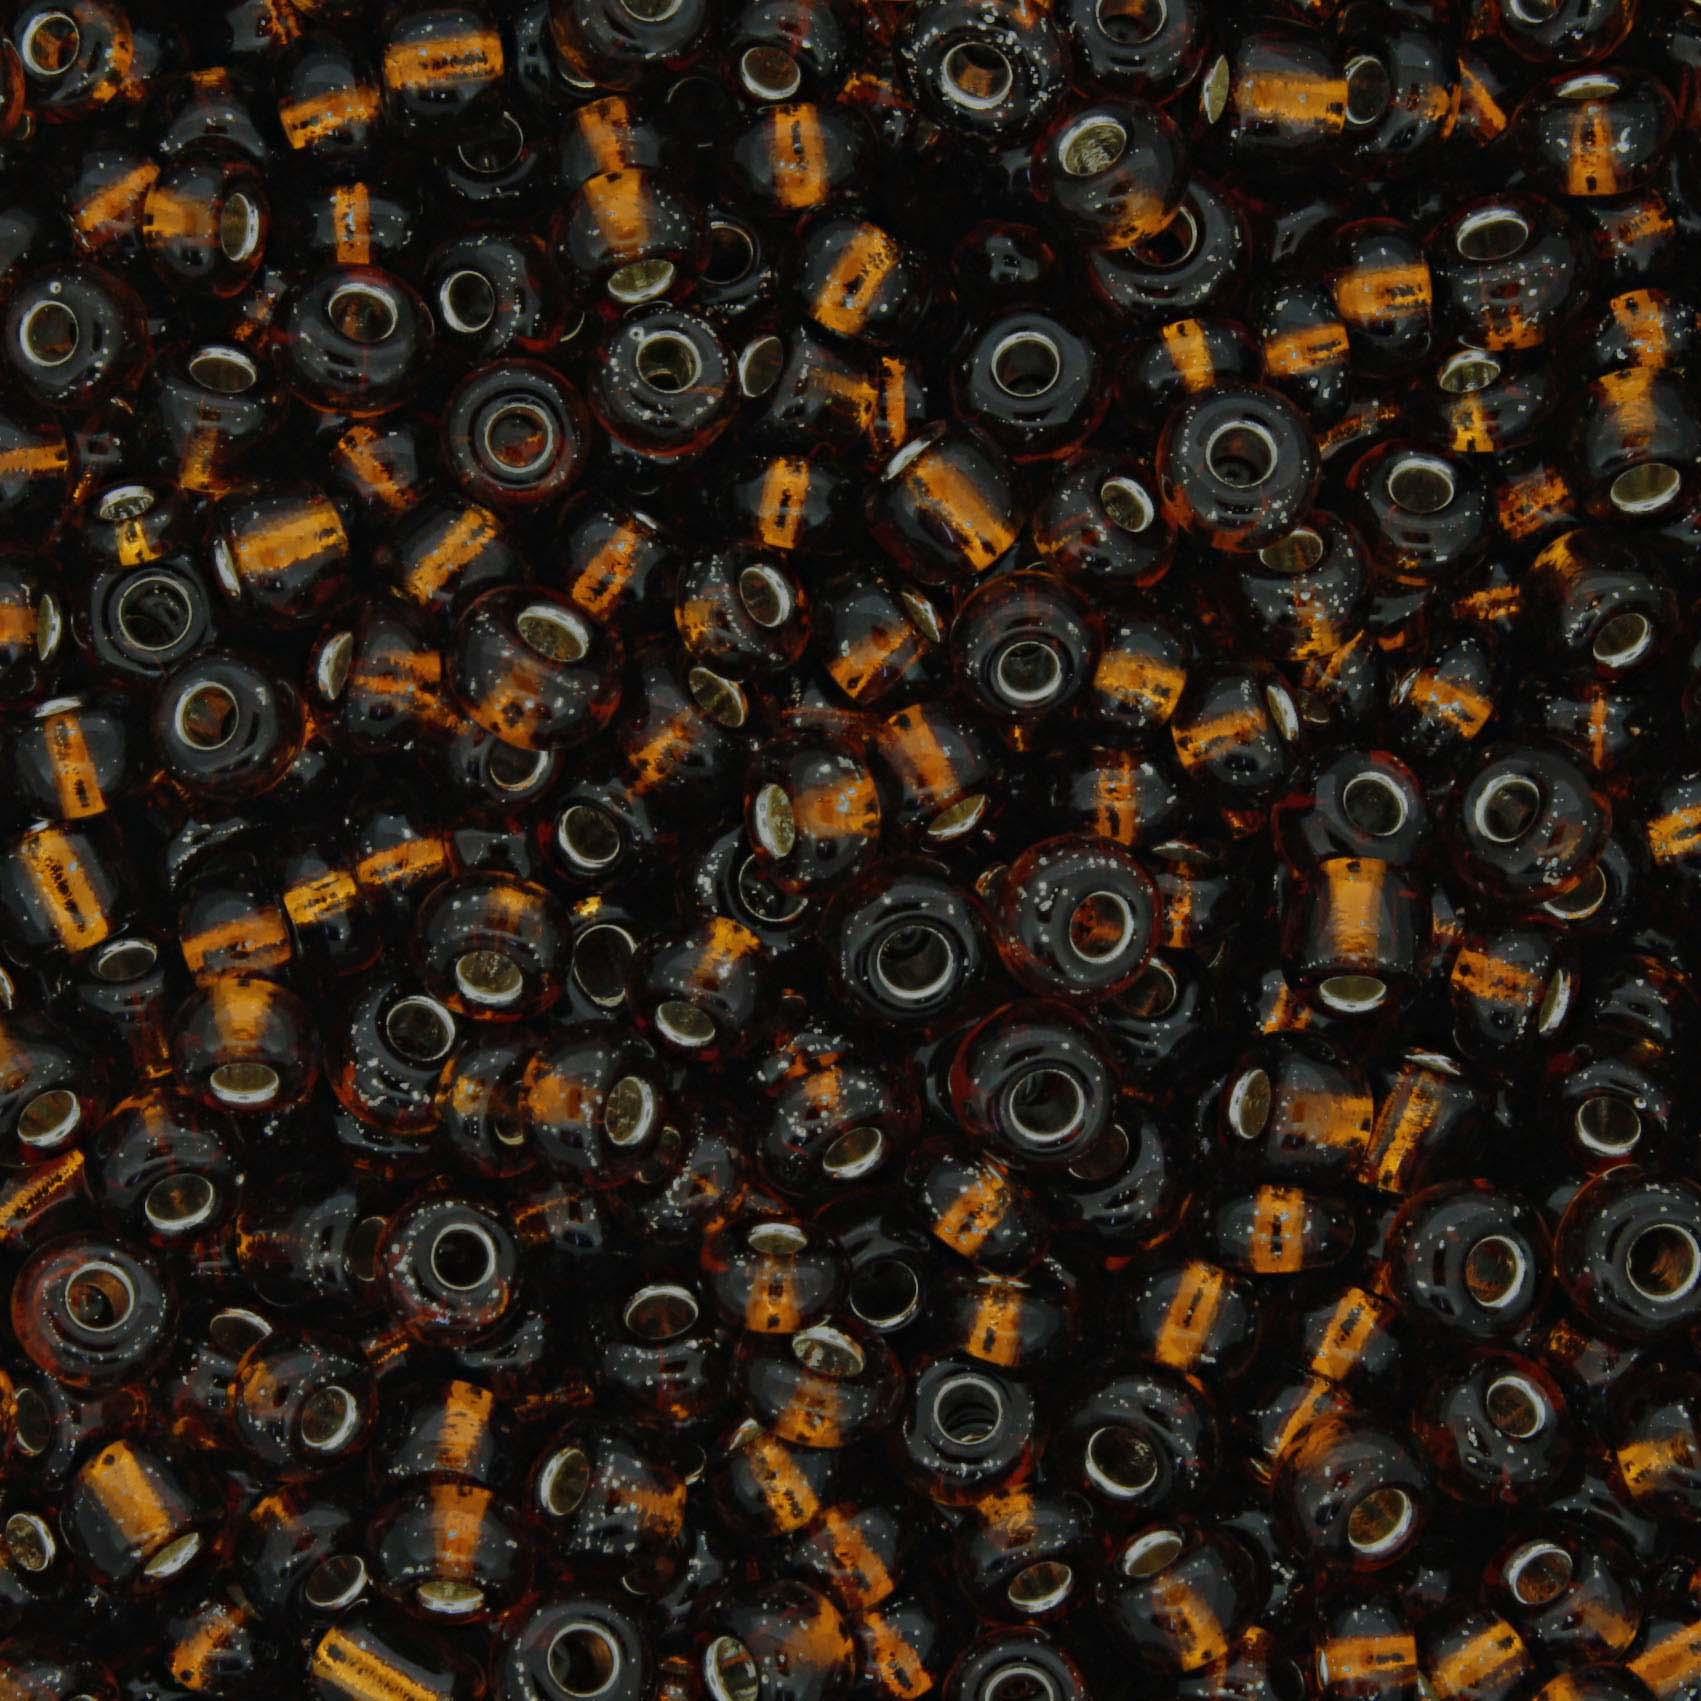 Miçanga - Marrom Transparente - 6/0 [4x3mm]  - Stéphanie Bijoux® - Peças para Bijuterias e Artesanato